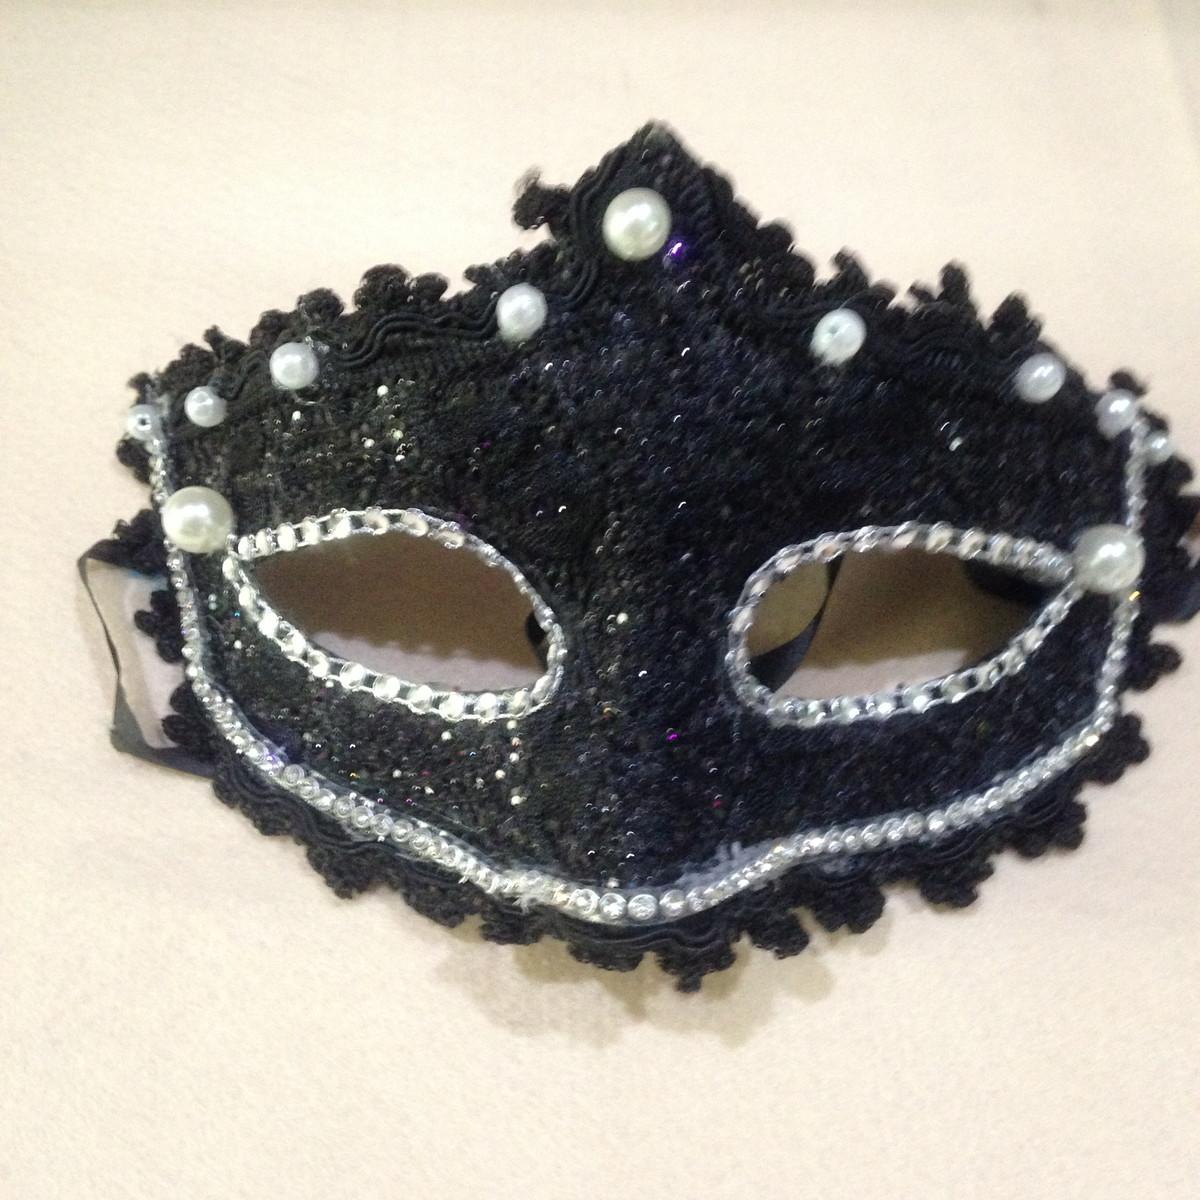 7266fdd16038e Mascara de luxo para carnaval baile no Elo7   Chá de Mar (B2AF99)